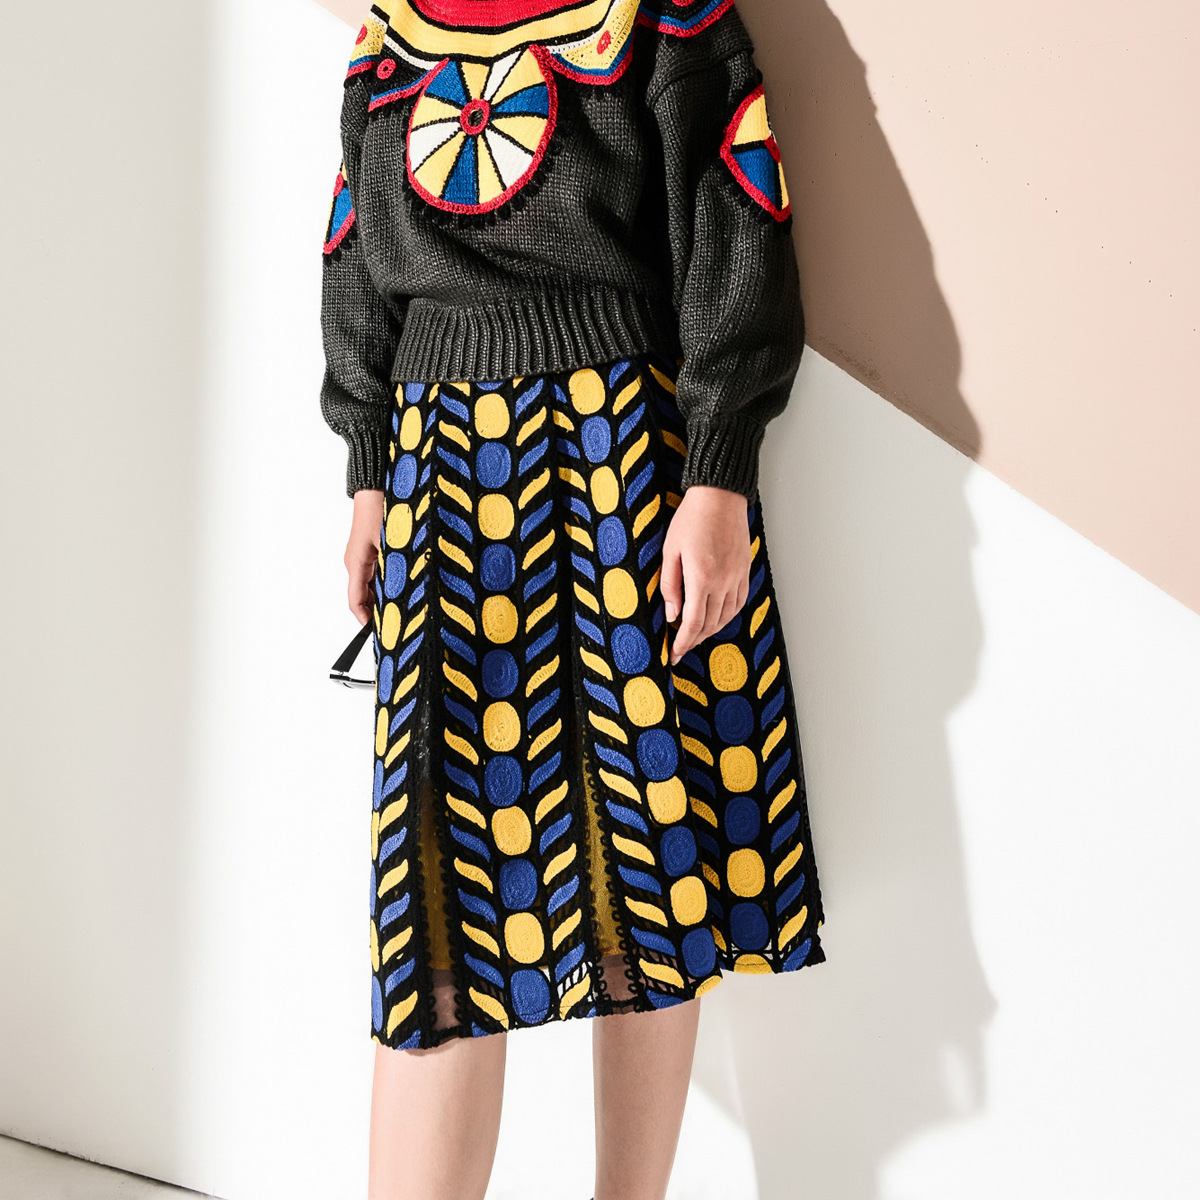 Women Skirt New Cross Border Special Geometric Heavy Long Skirts mesh lace Saias Na Altura Do Joelho Pleated Skirt Ladies Skirts